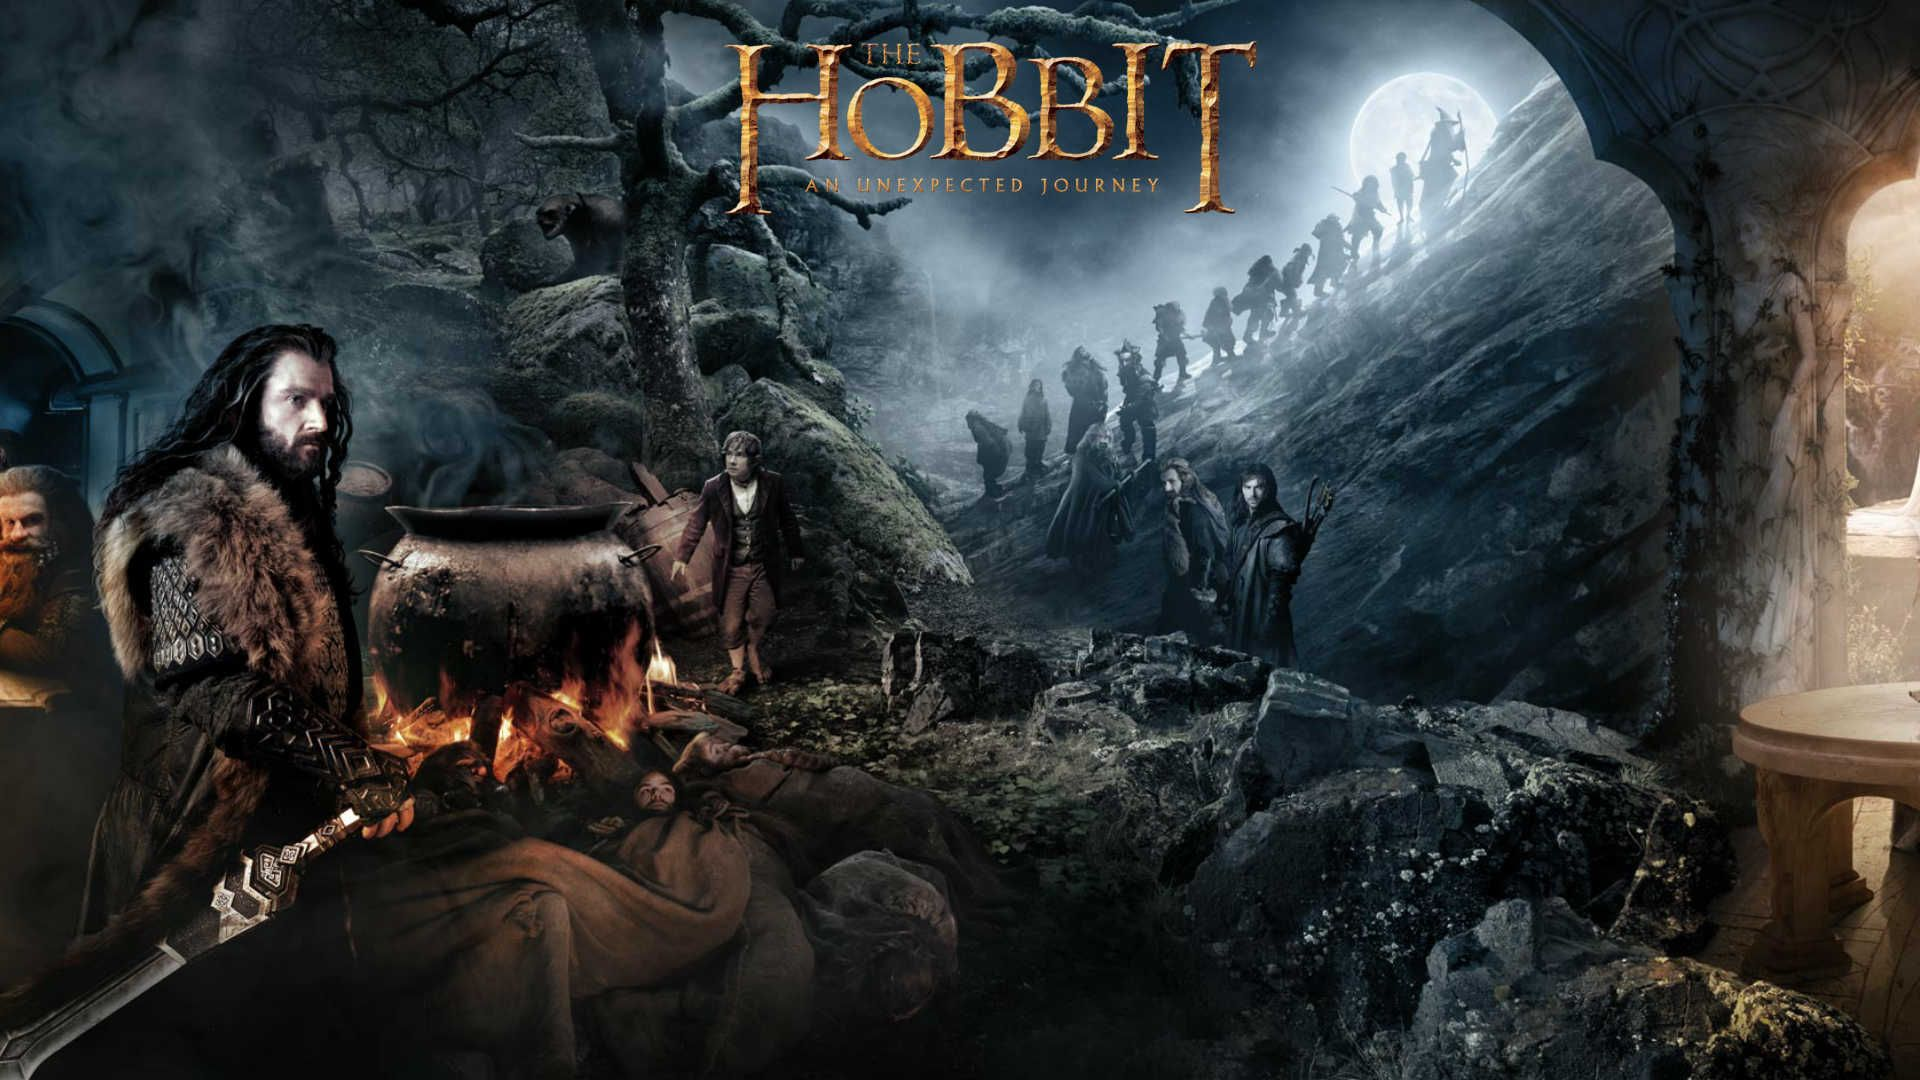 Mobile And Desktop Wallpaper Hd The Hobbit Hobbit An Unexpected Journey The Hobbit Movies